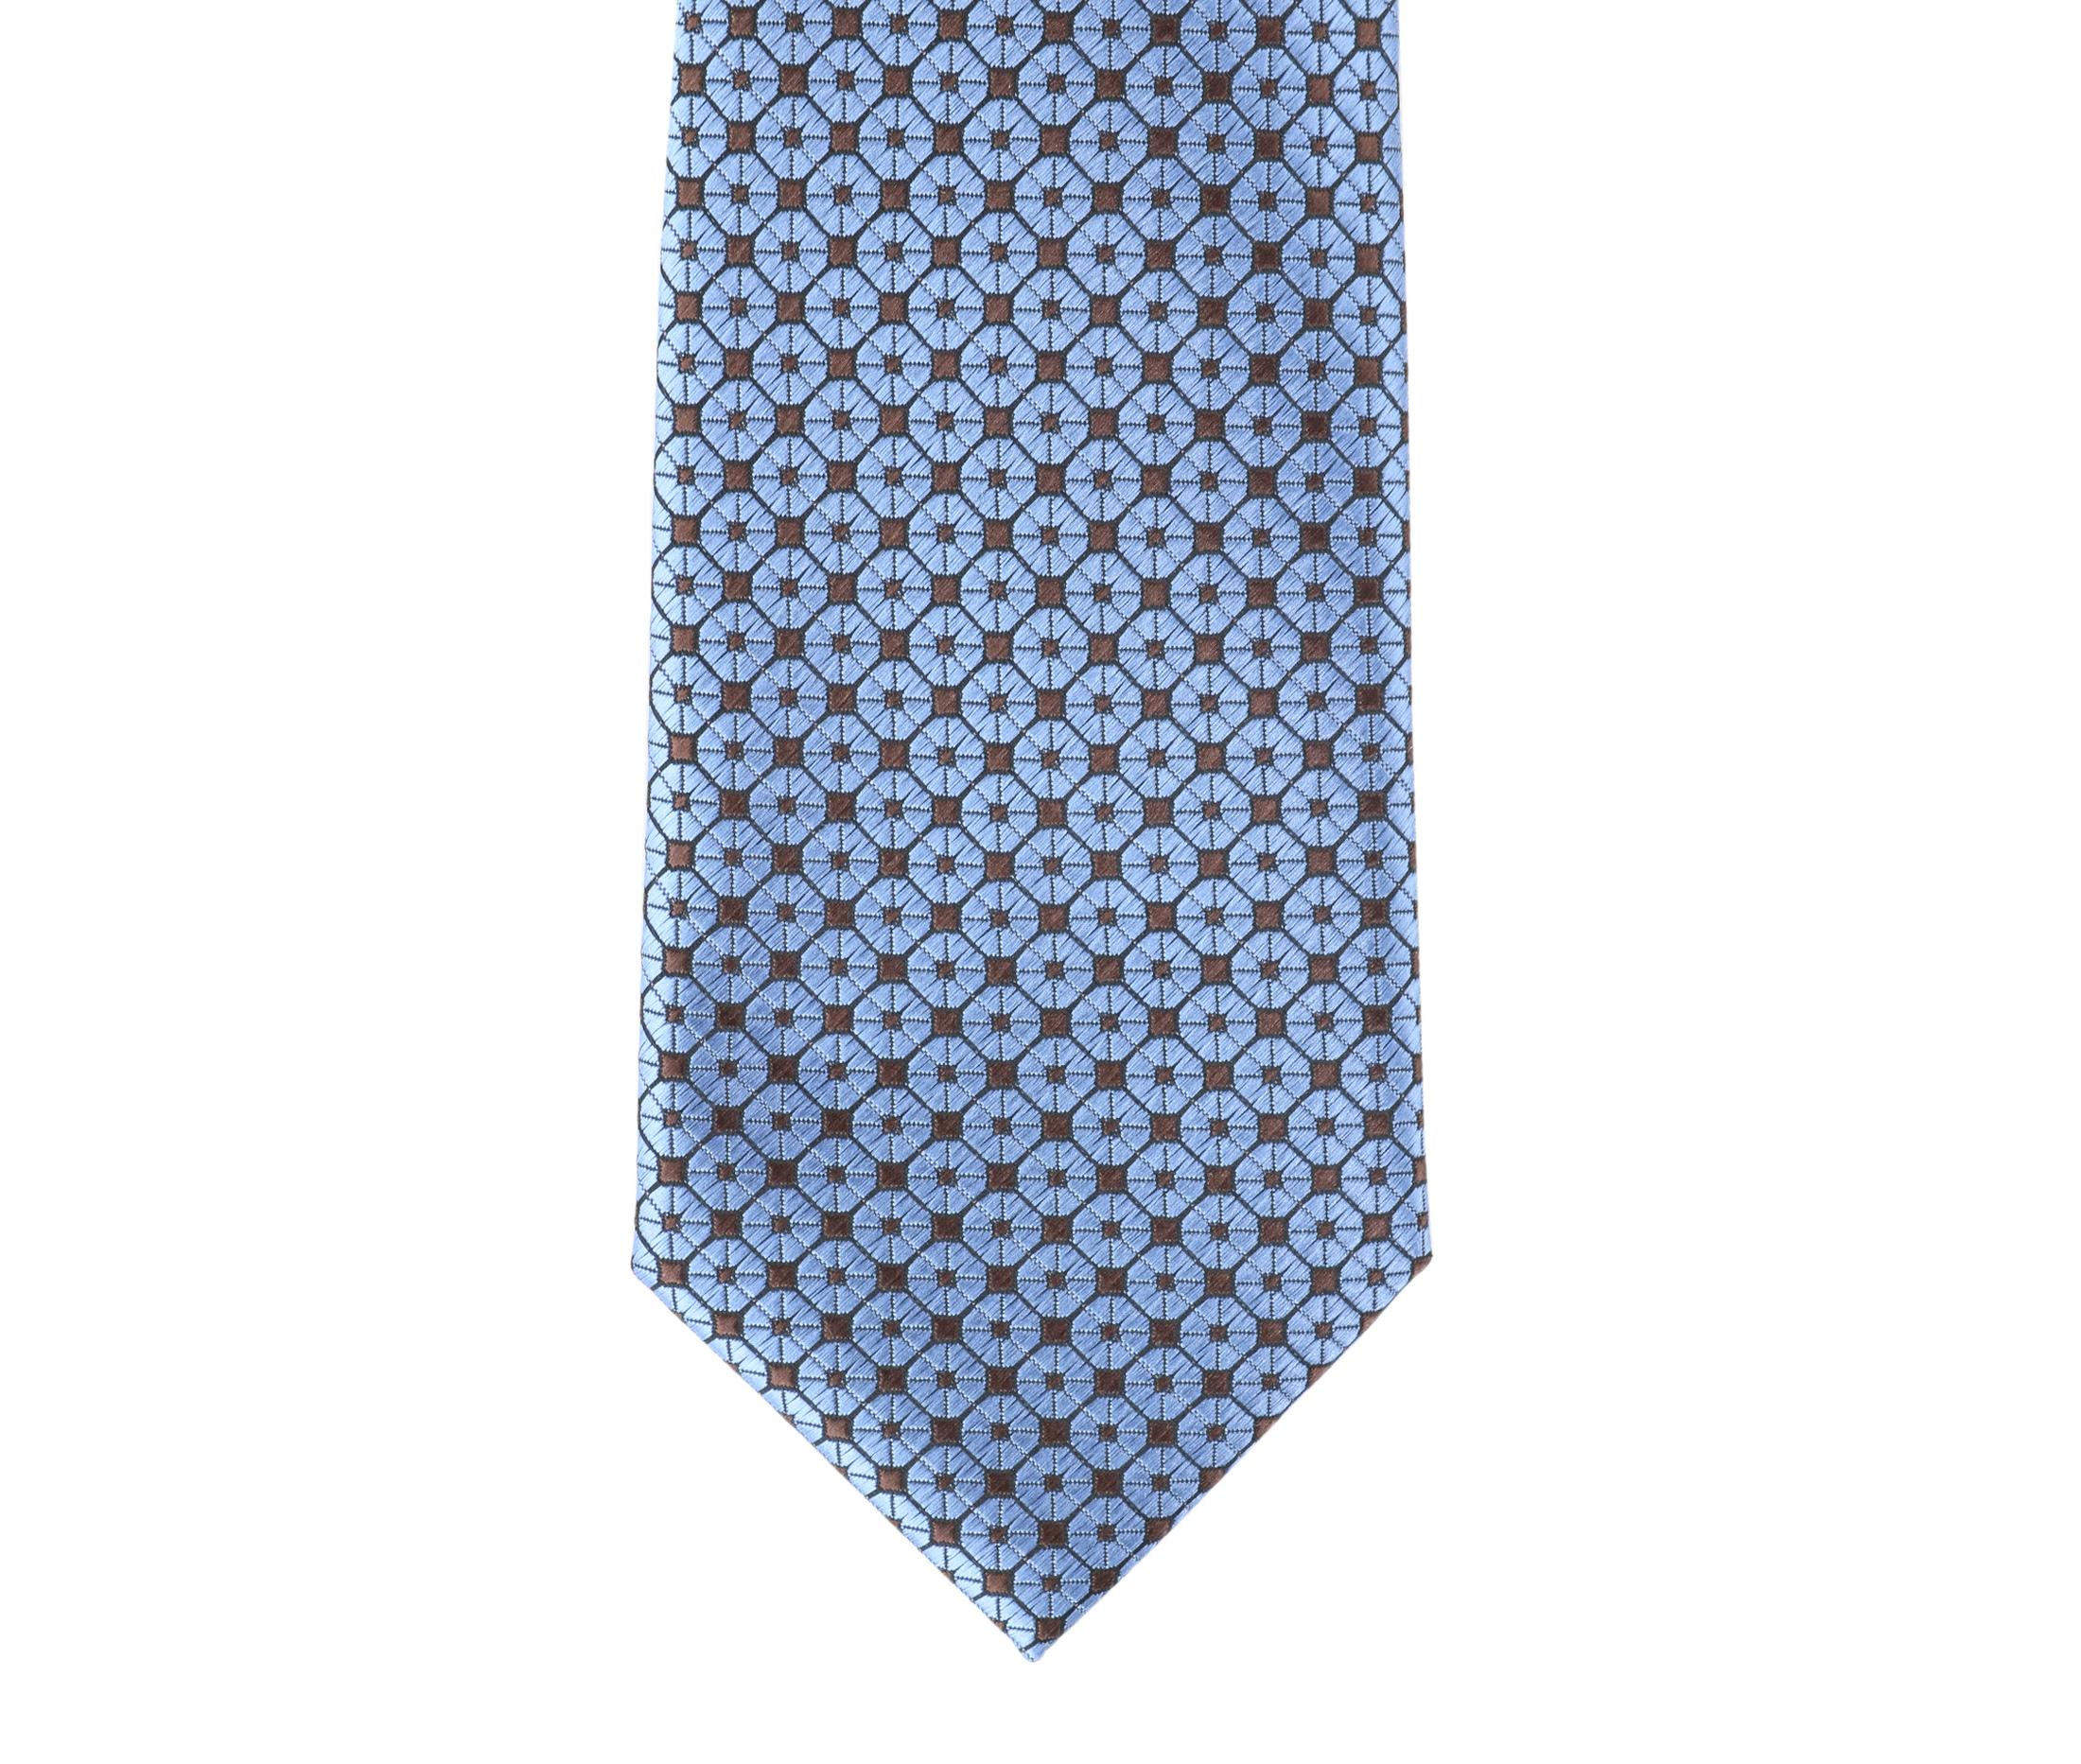 Krawatte Seide Dessin Blau 9-17 foto 1